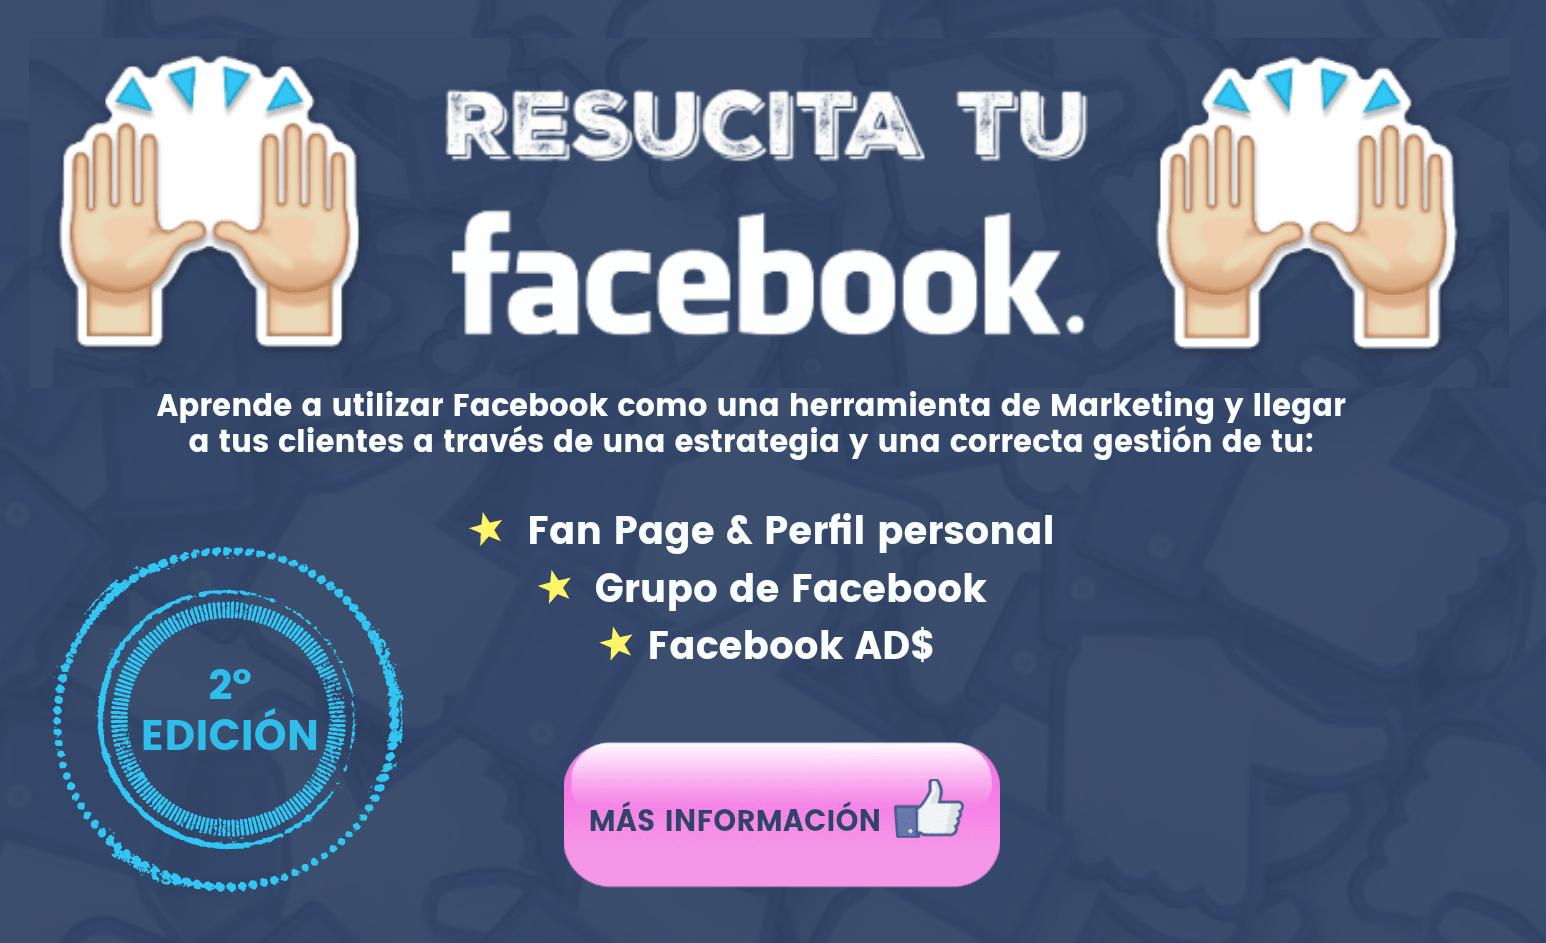 Resucita tu Facebook segunda edición